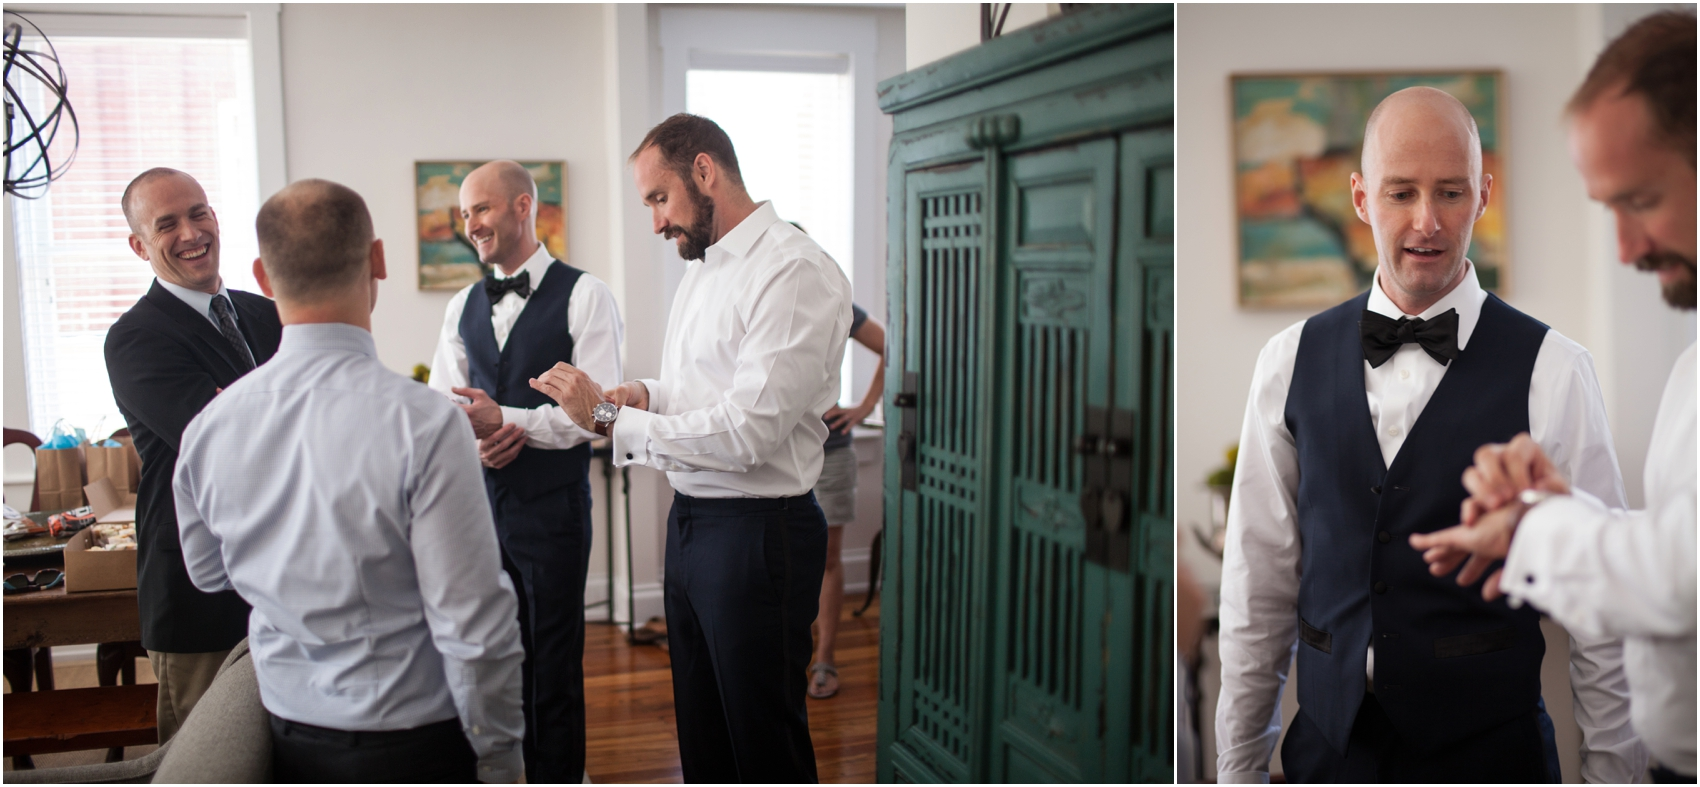 Old-Metropolitan-Hall-Wedding-Charlottesville-Virginia-60.jpg